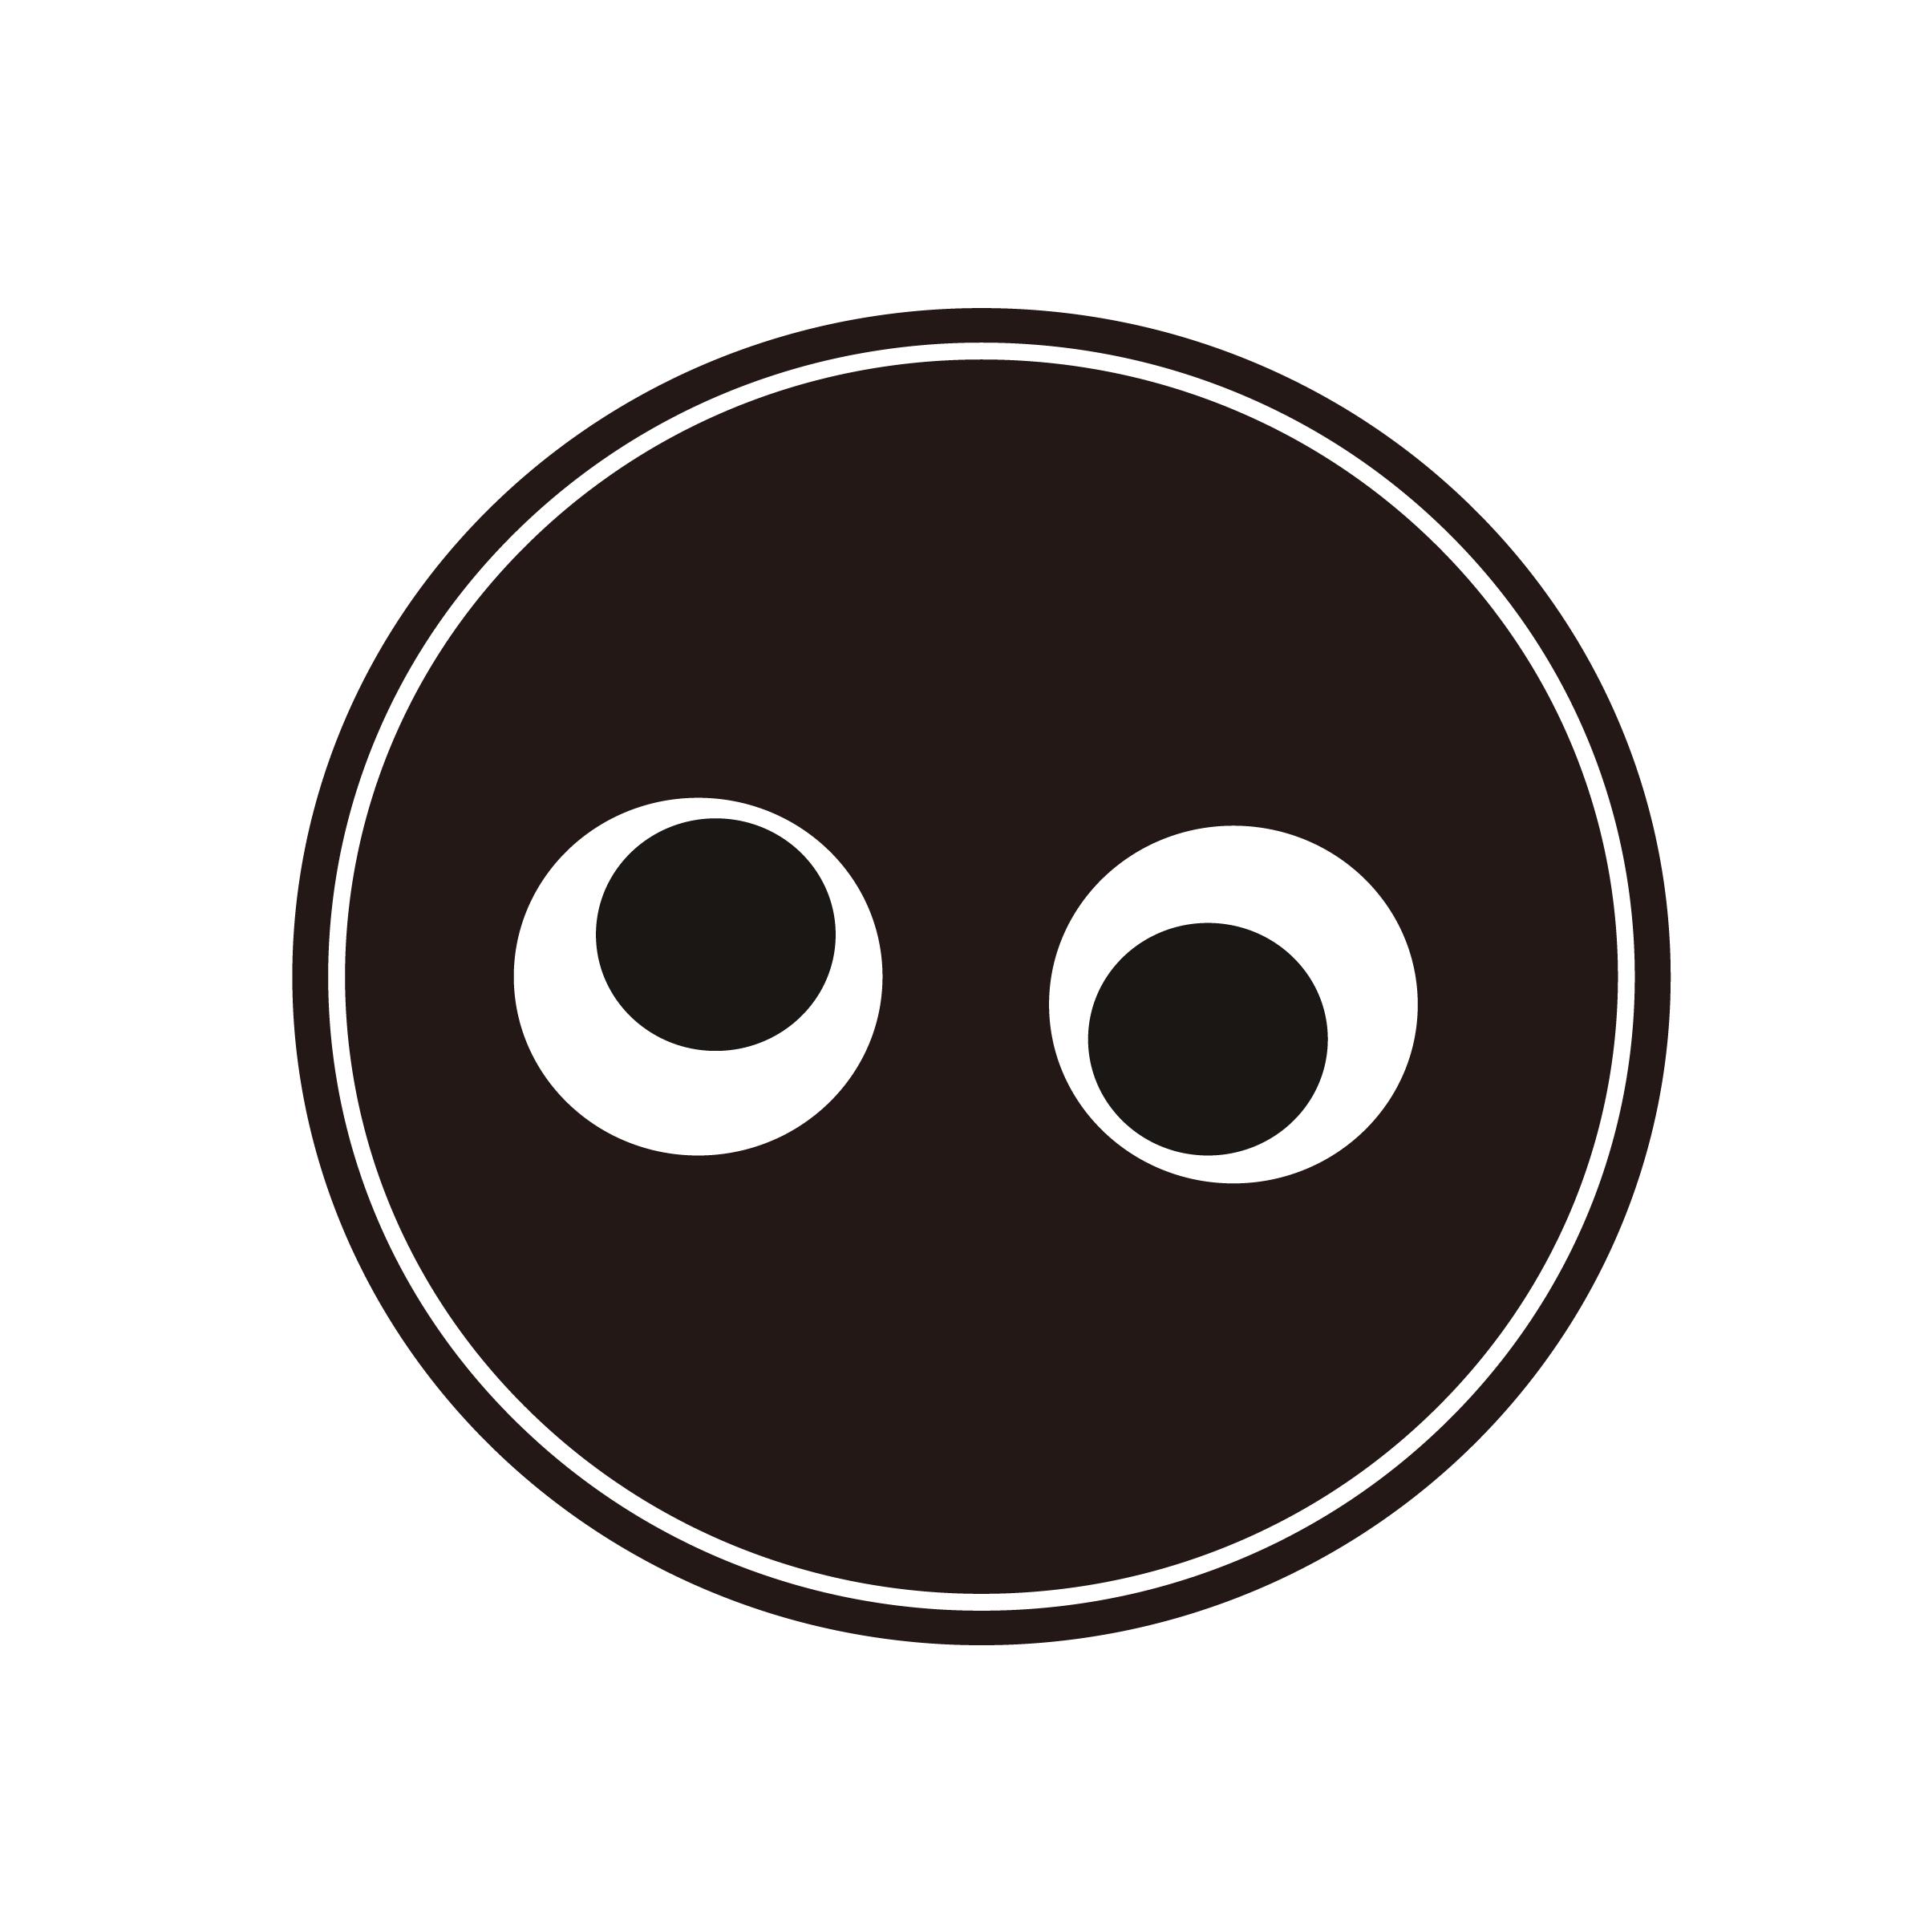 玩目app